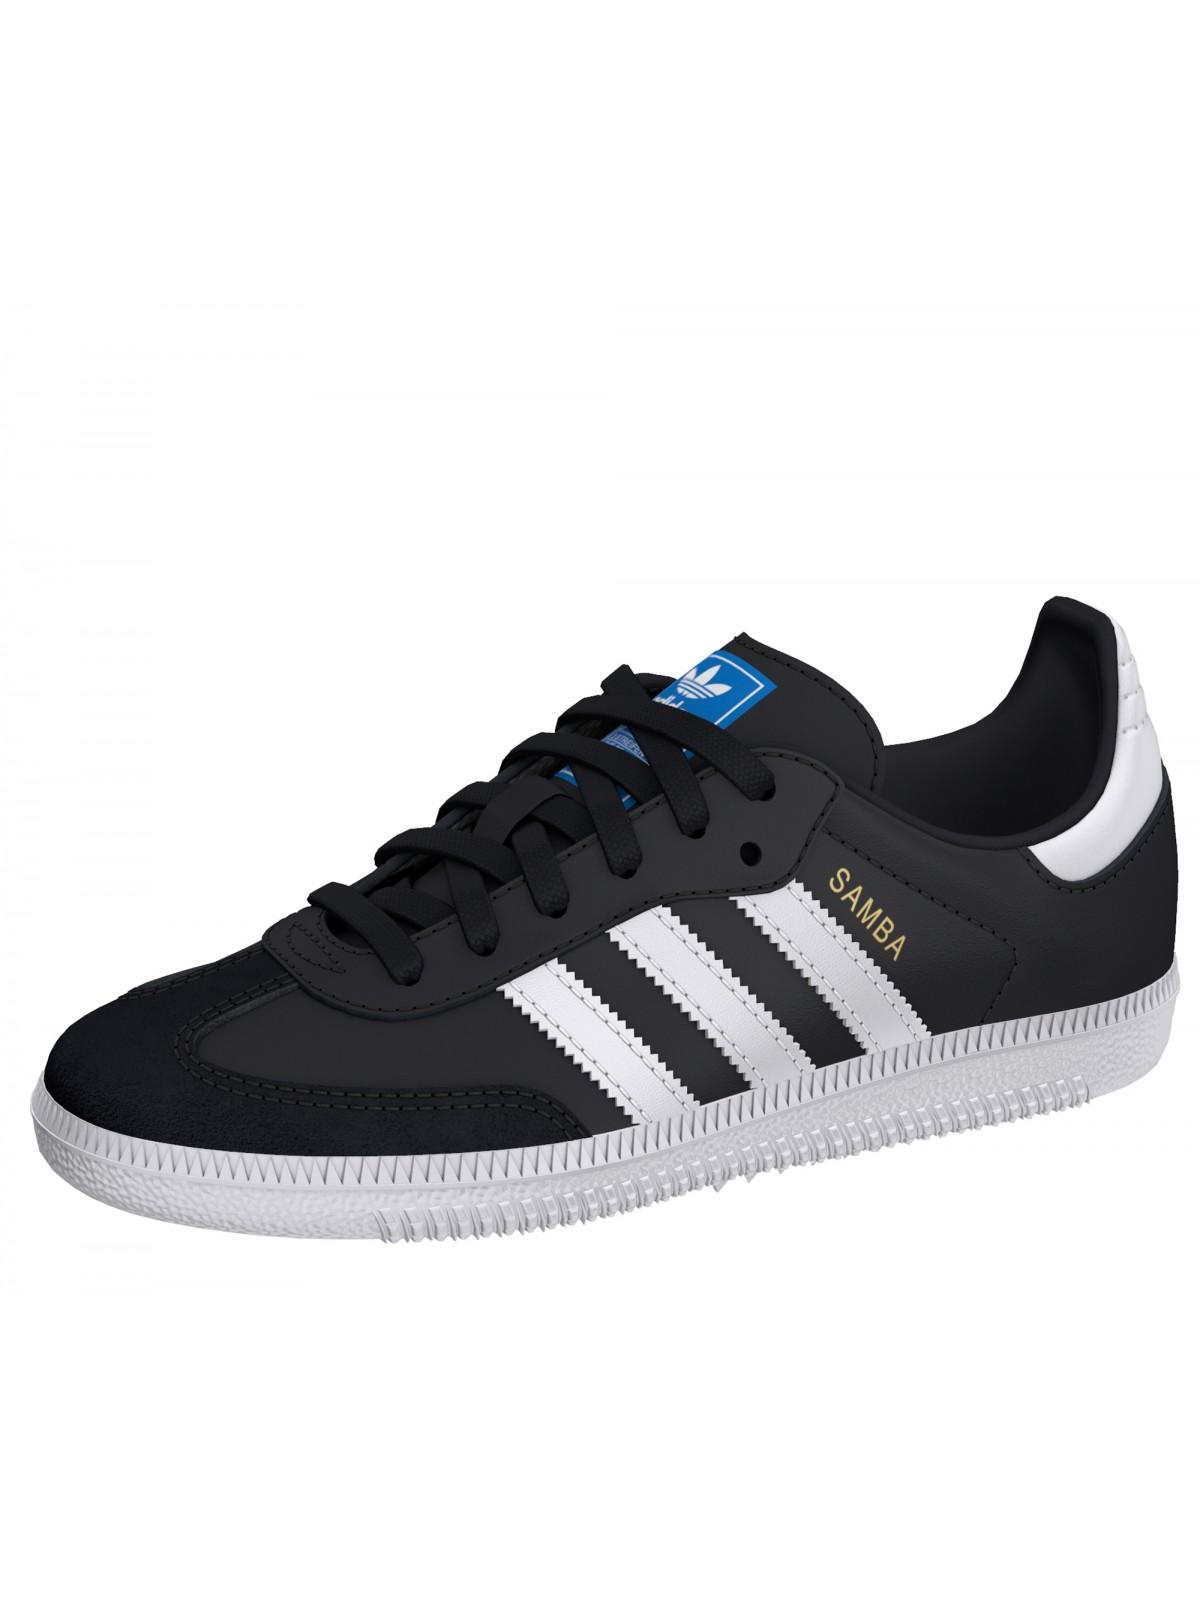 uk store outlet boutique low price sale Adidas Samba Cadet noir - Soldes